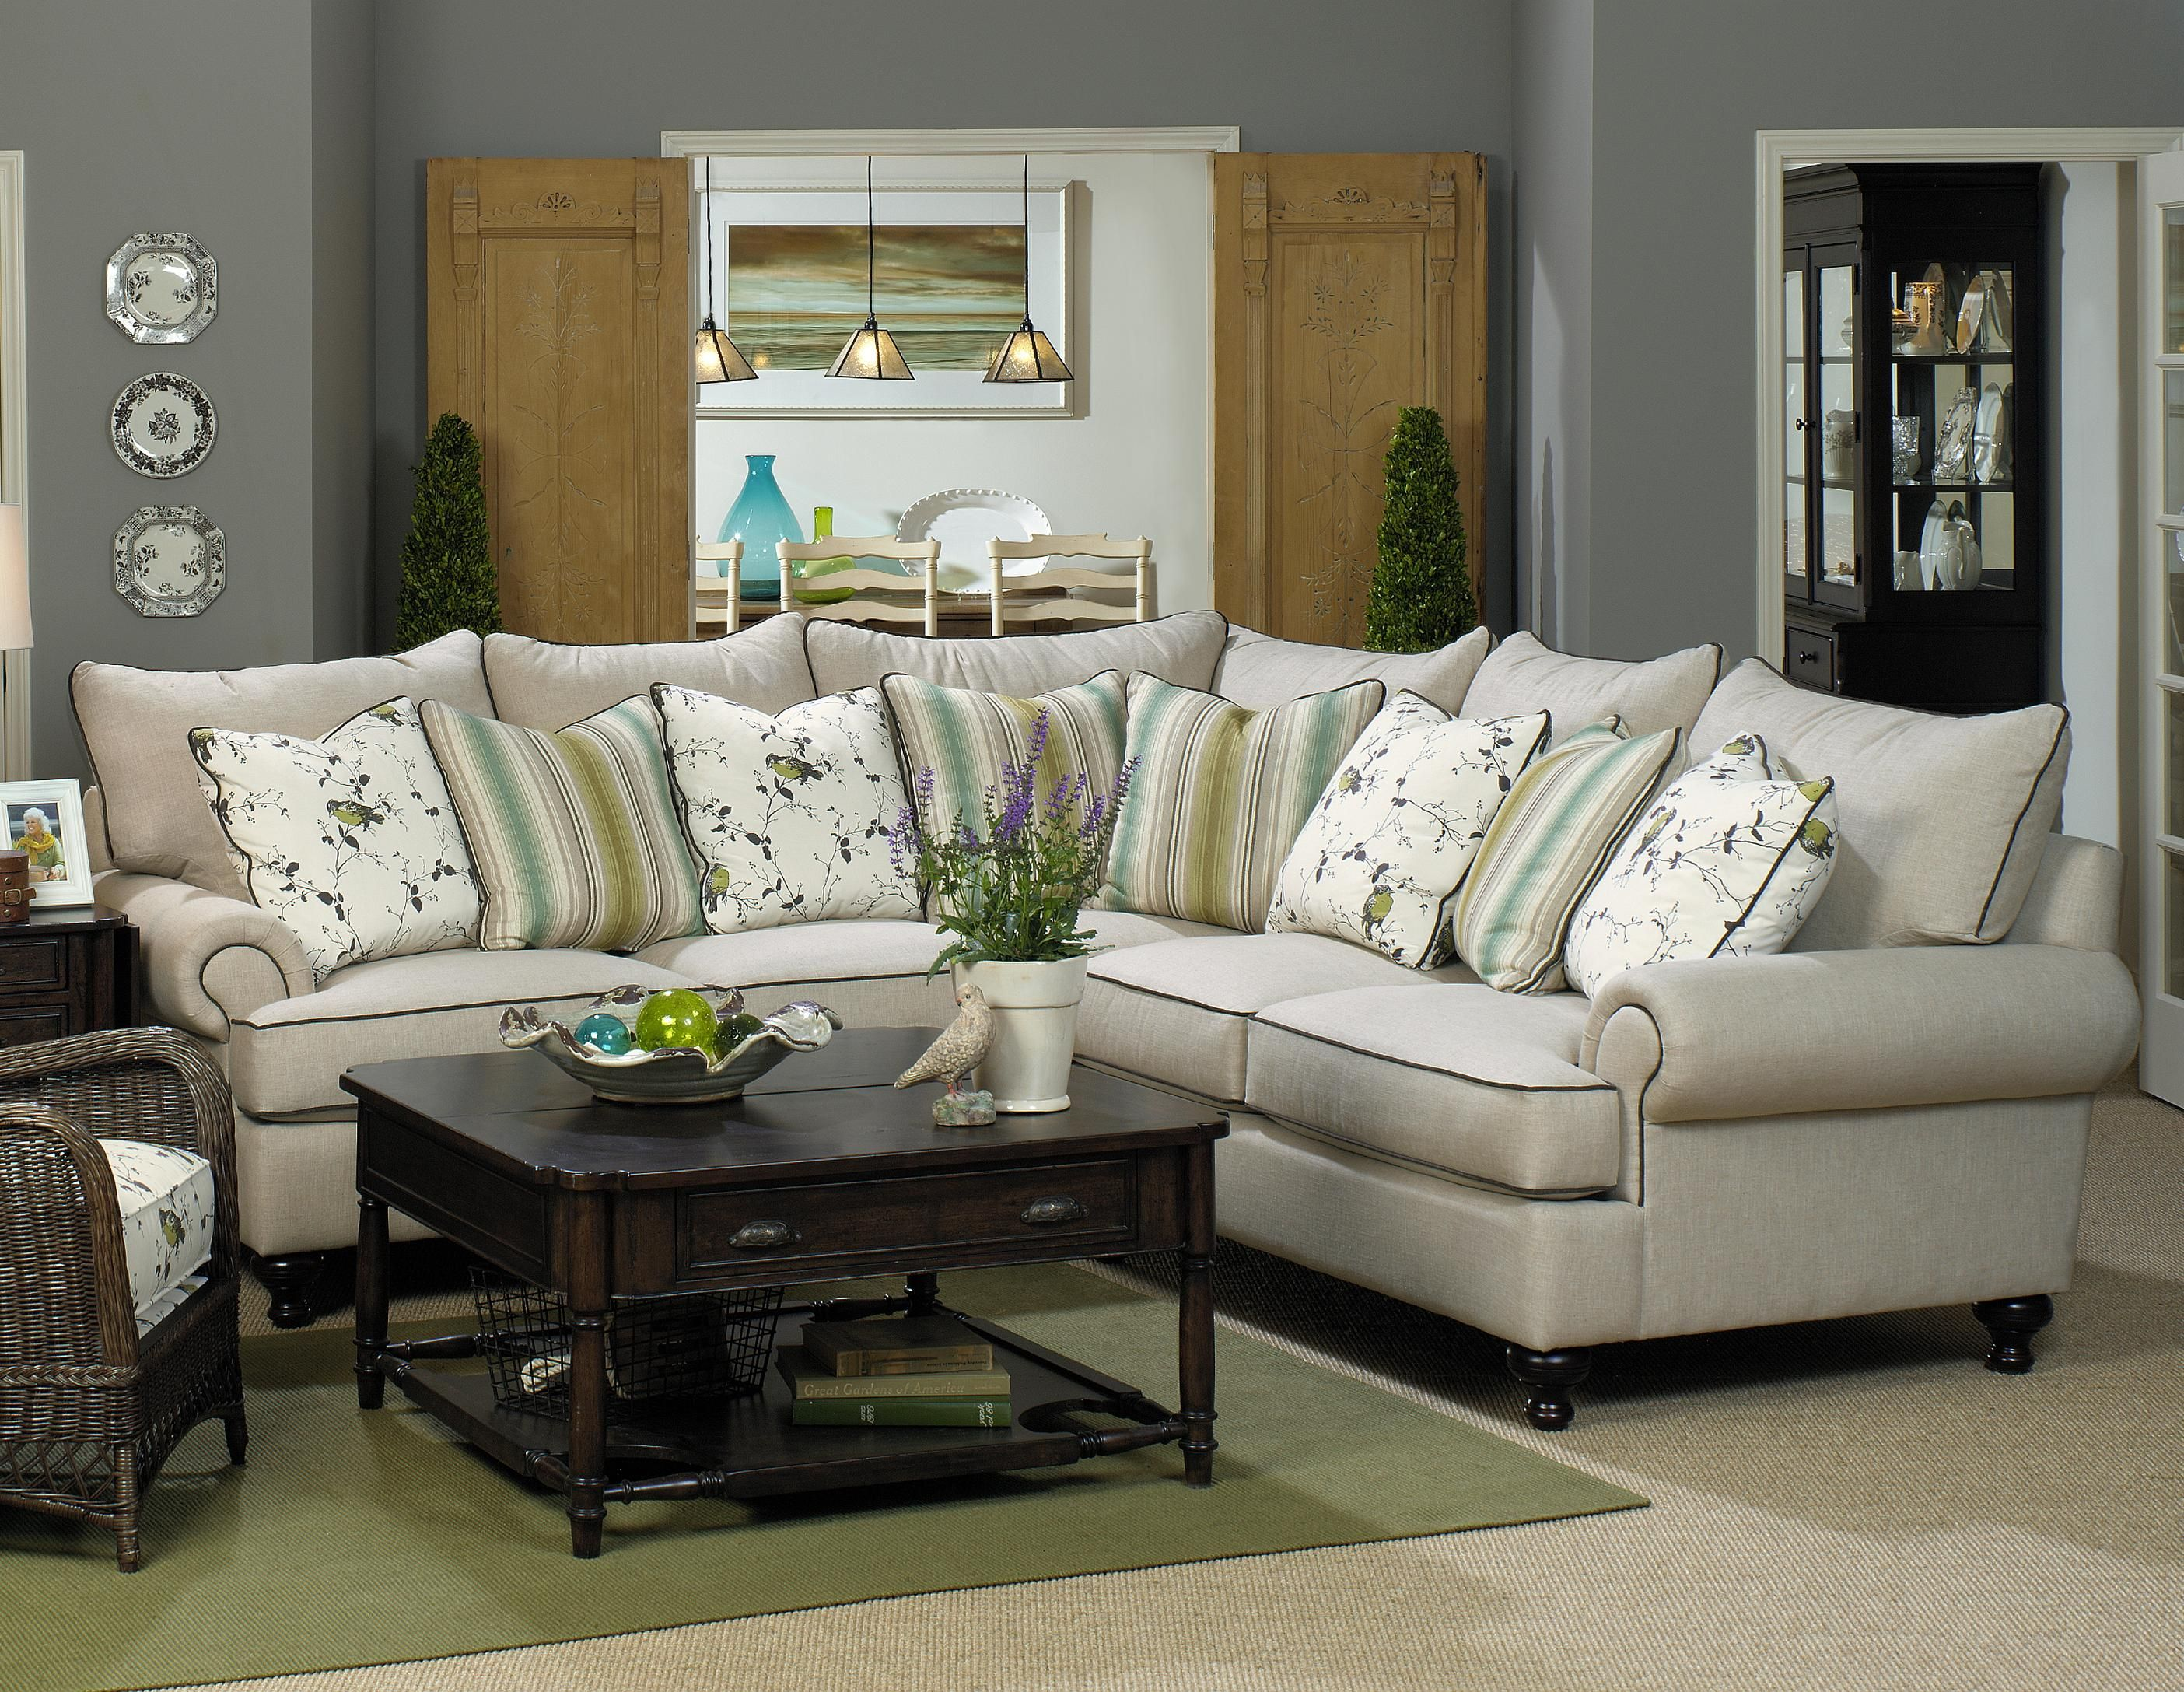 Paula Deen Home 2Piece Sectional Sofapaula Deenuniversal Amazing Paula Deen Dining Room Set Decorating Inspiration